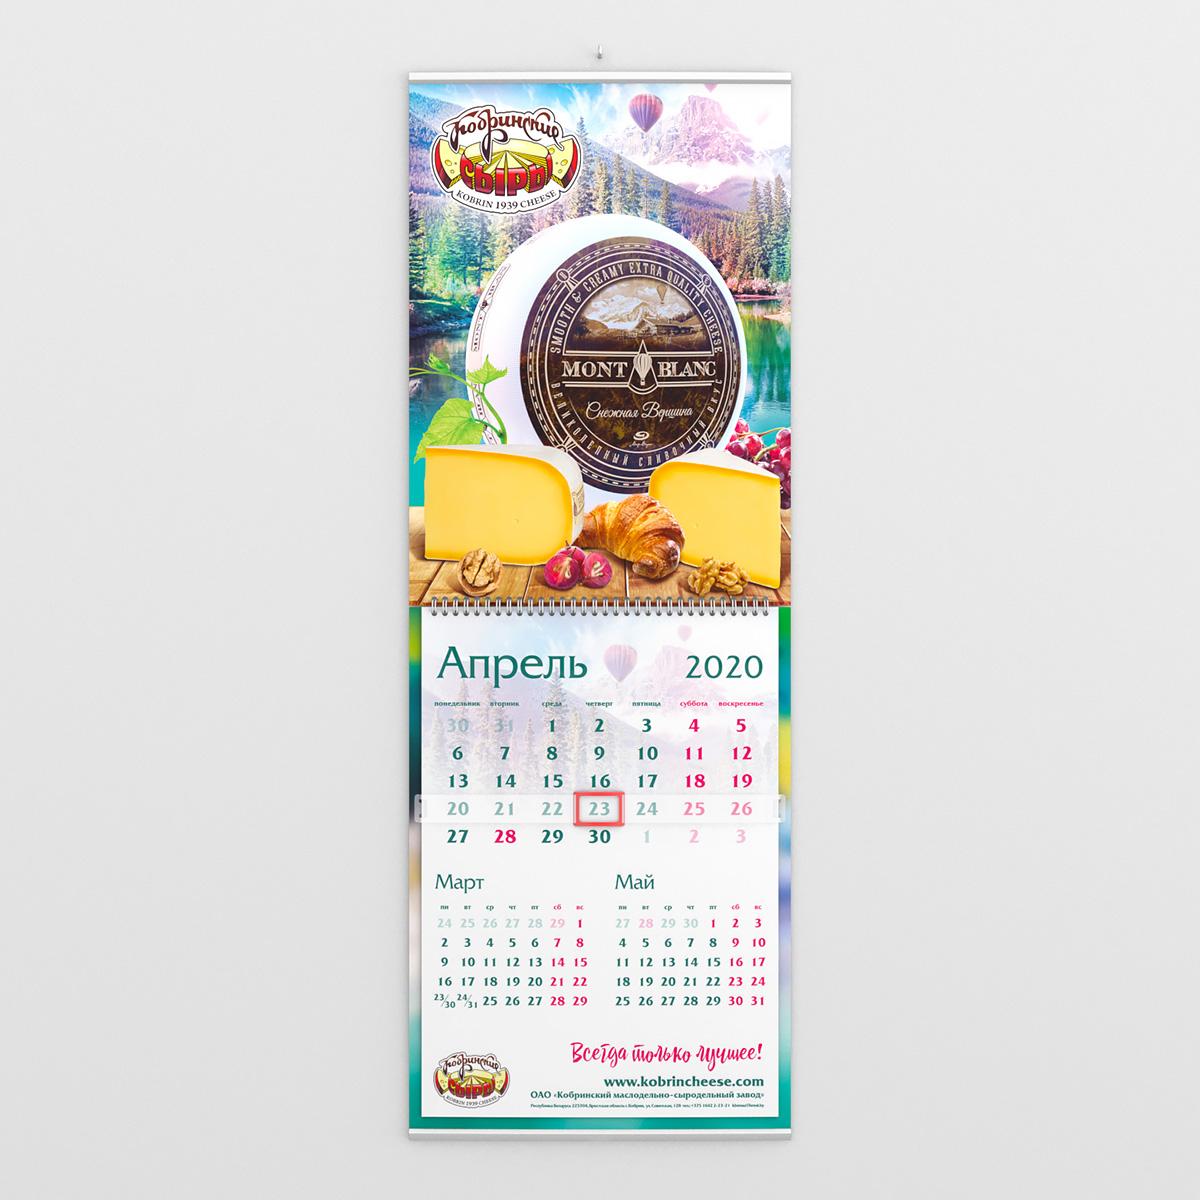 Кобринский МСЗ - календарь 2020